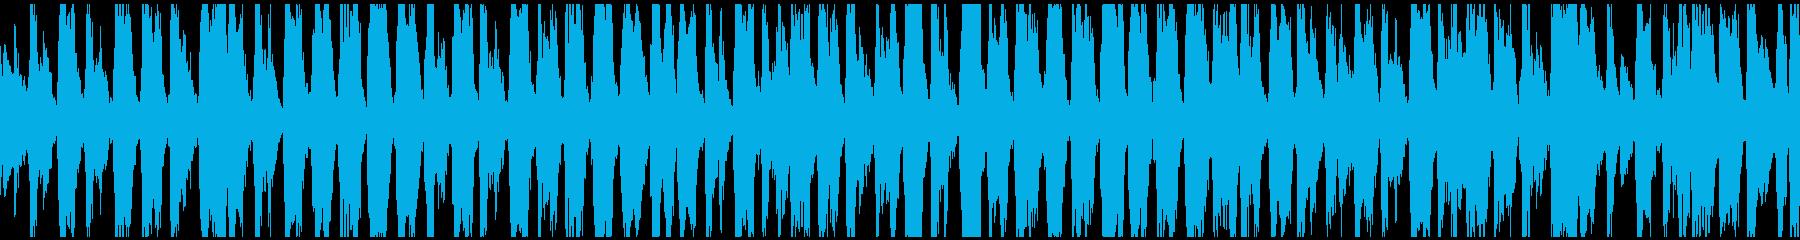 Uptempo、古いスタイルのジプ...の再生済みの波形